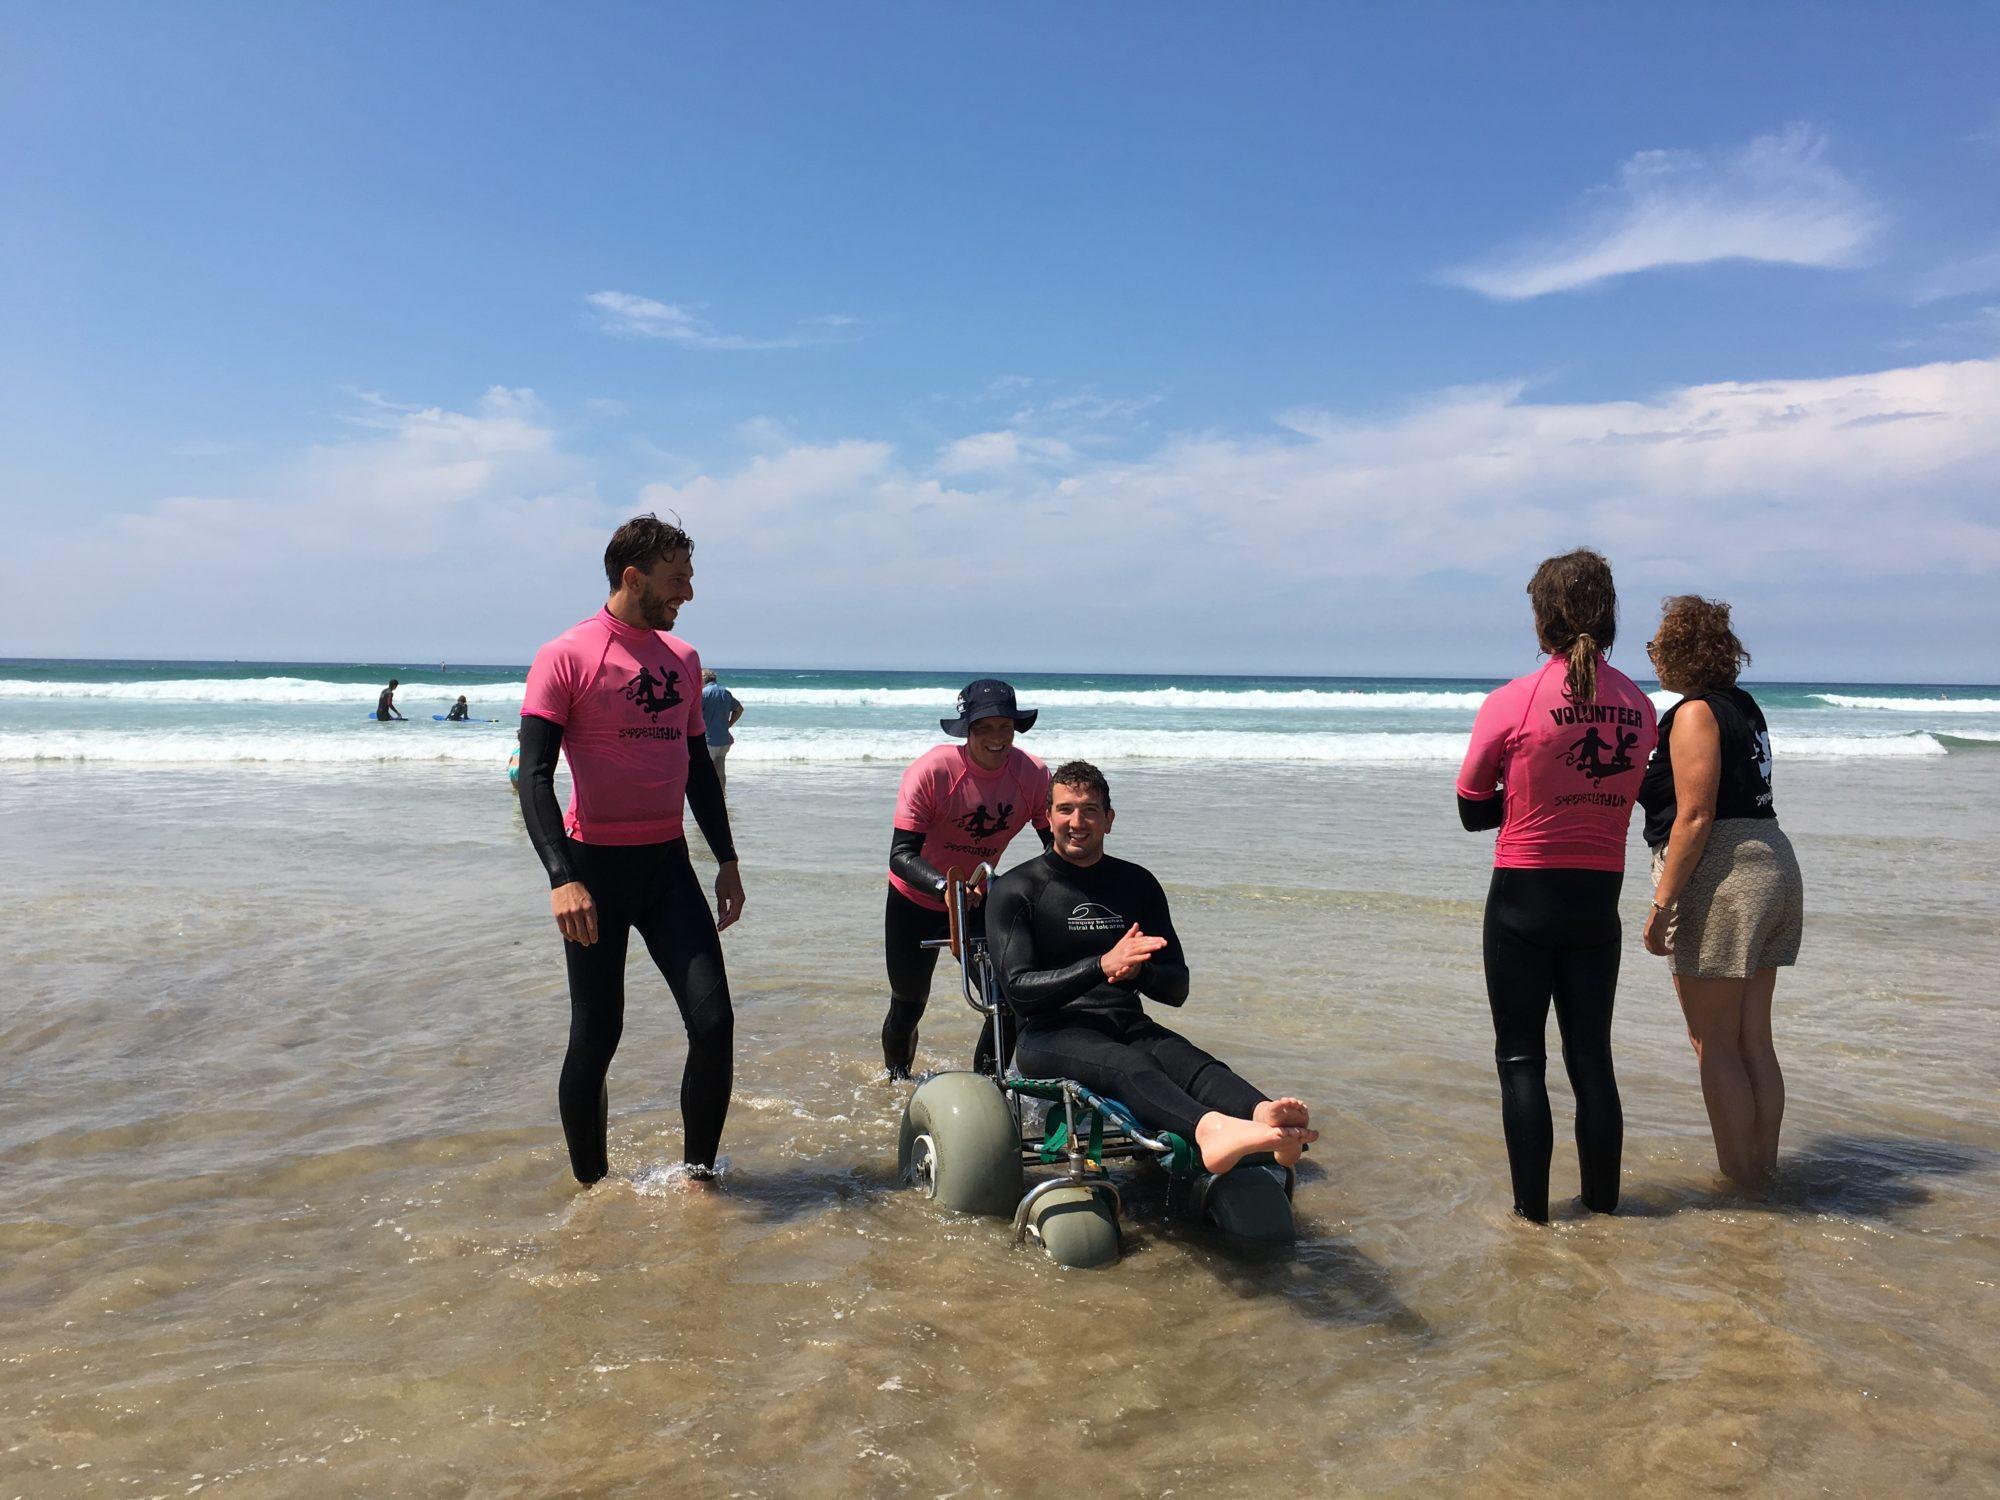 Darren Edwards with surf volunteers